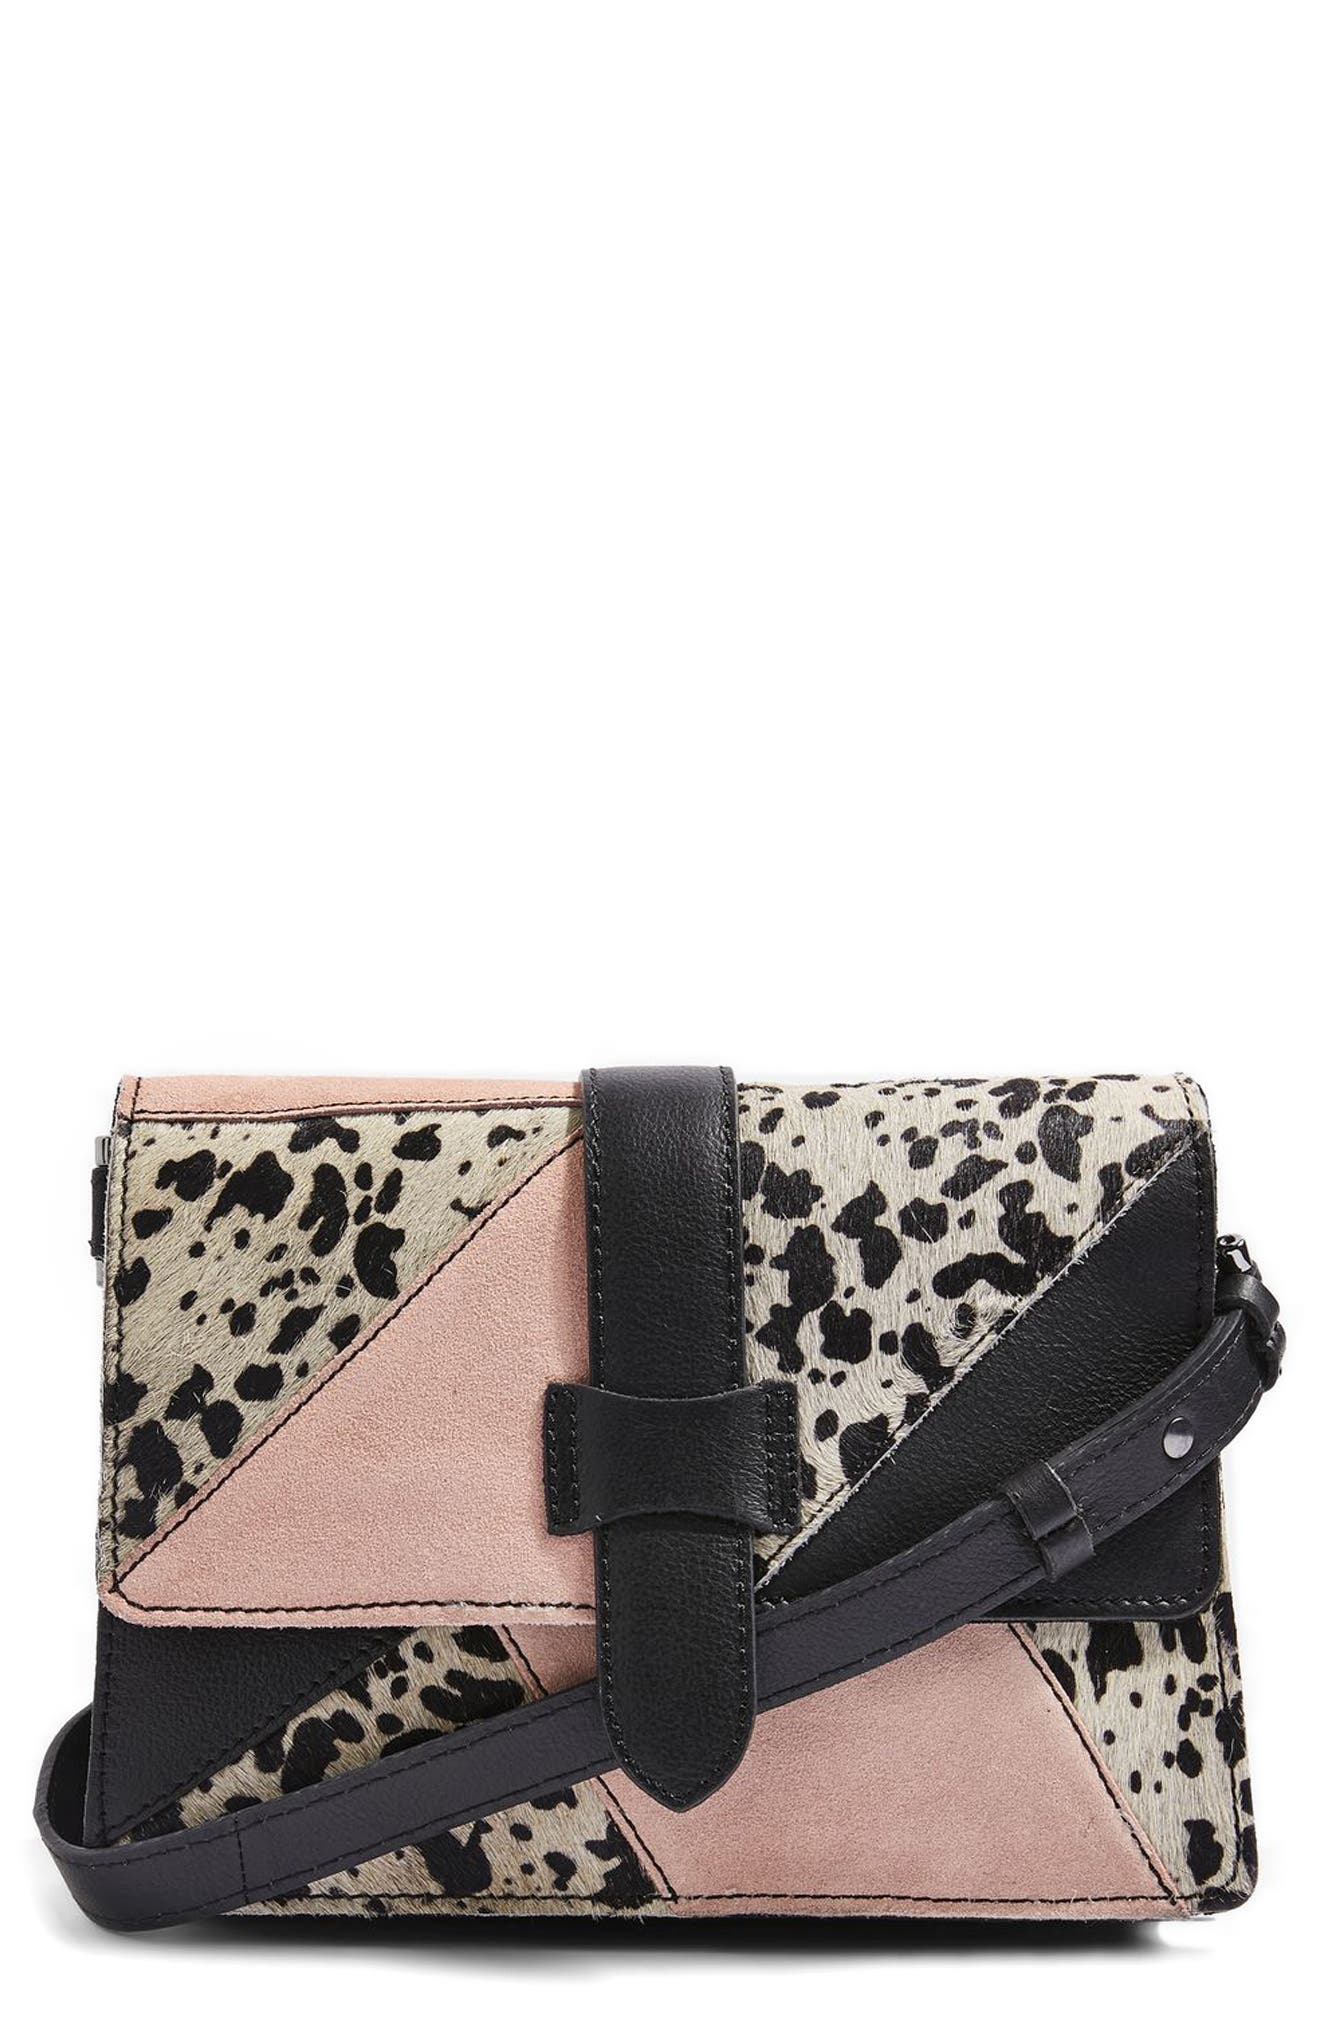 Premium Leather & Genuine Calf Hair Patchwork Crossbody Bag,                         Main,                         color, 001